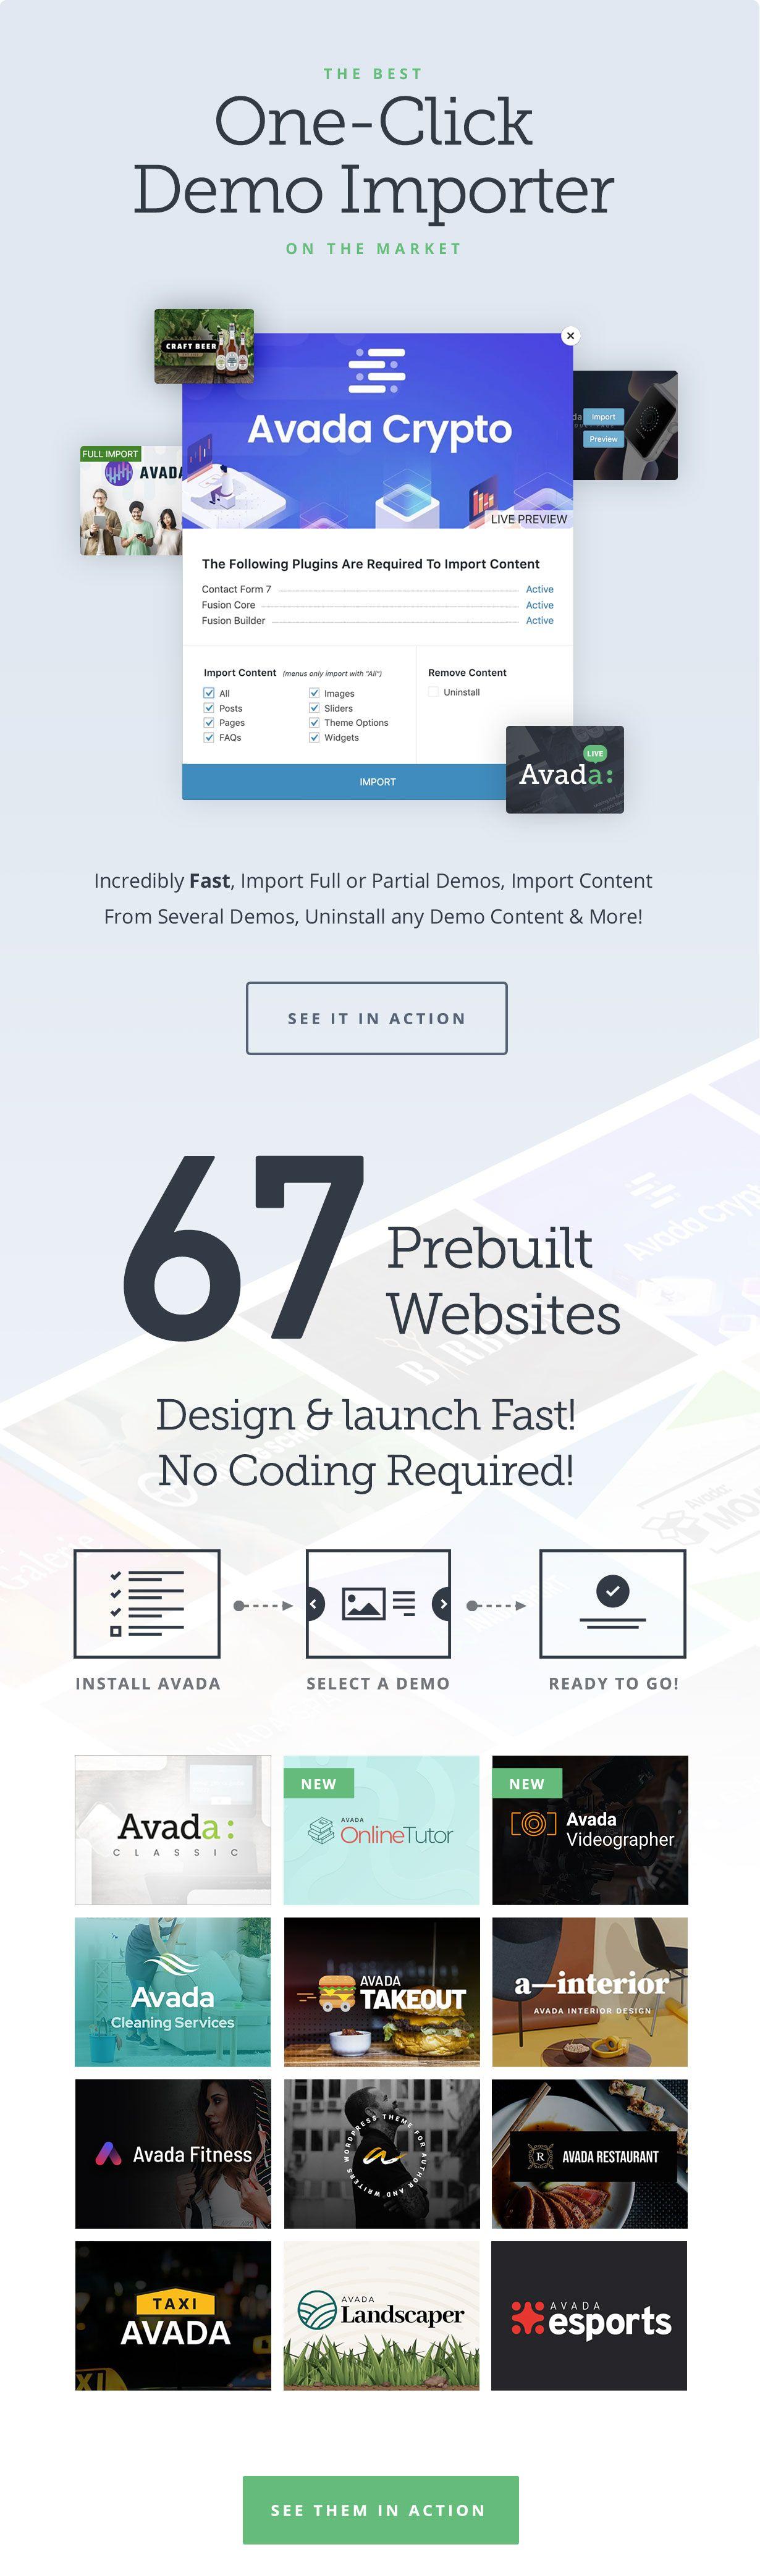 Avada | Website Builder For WordPress & WooCommerce - 15